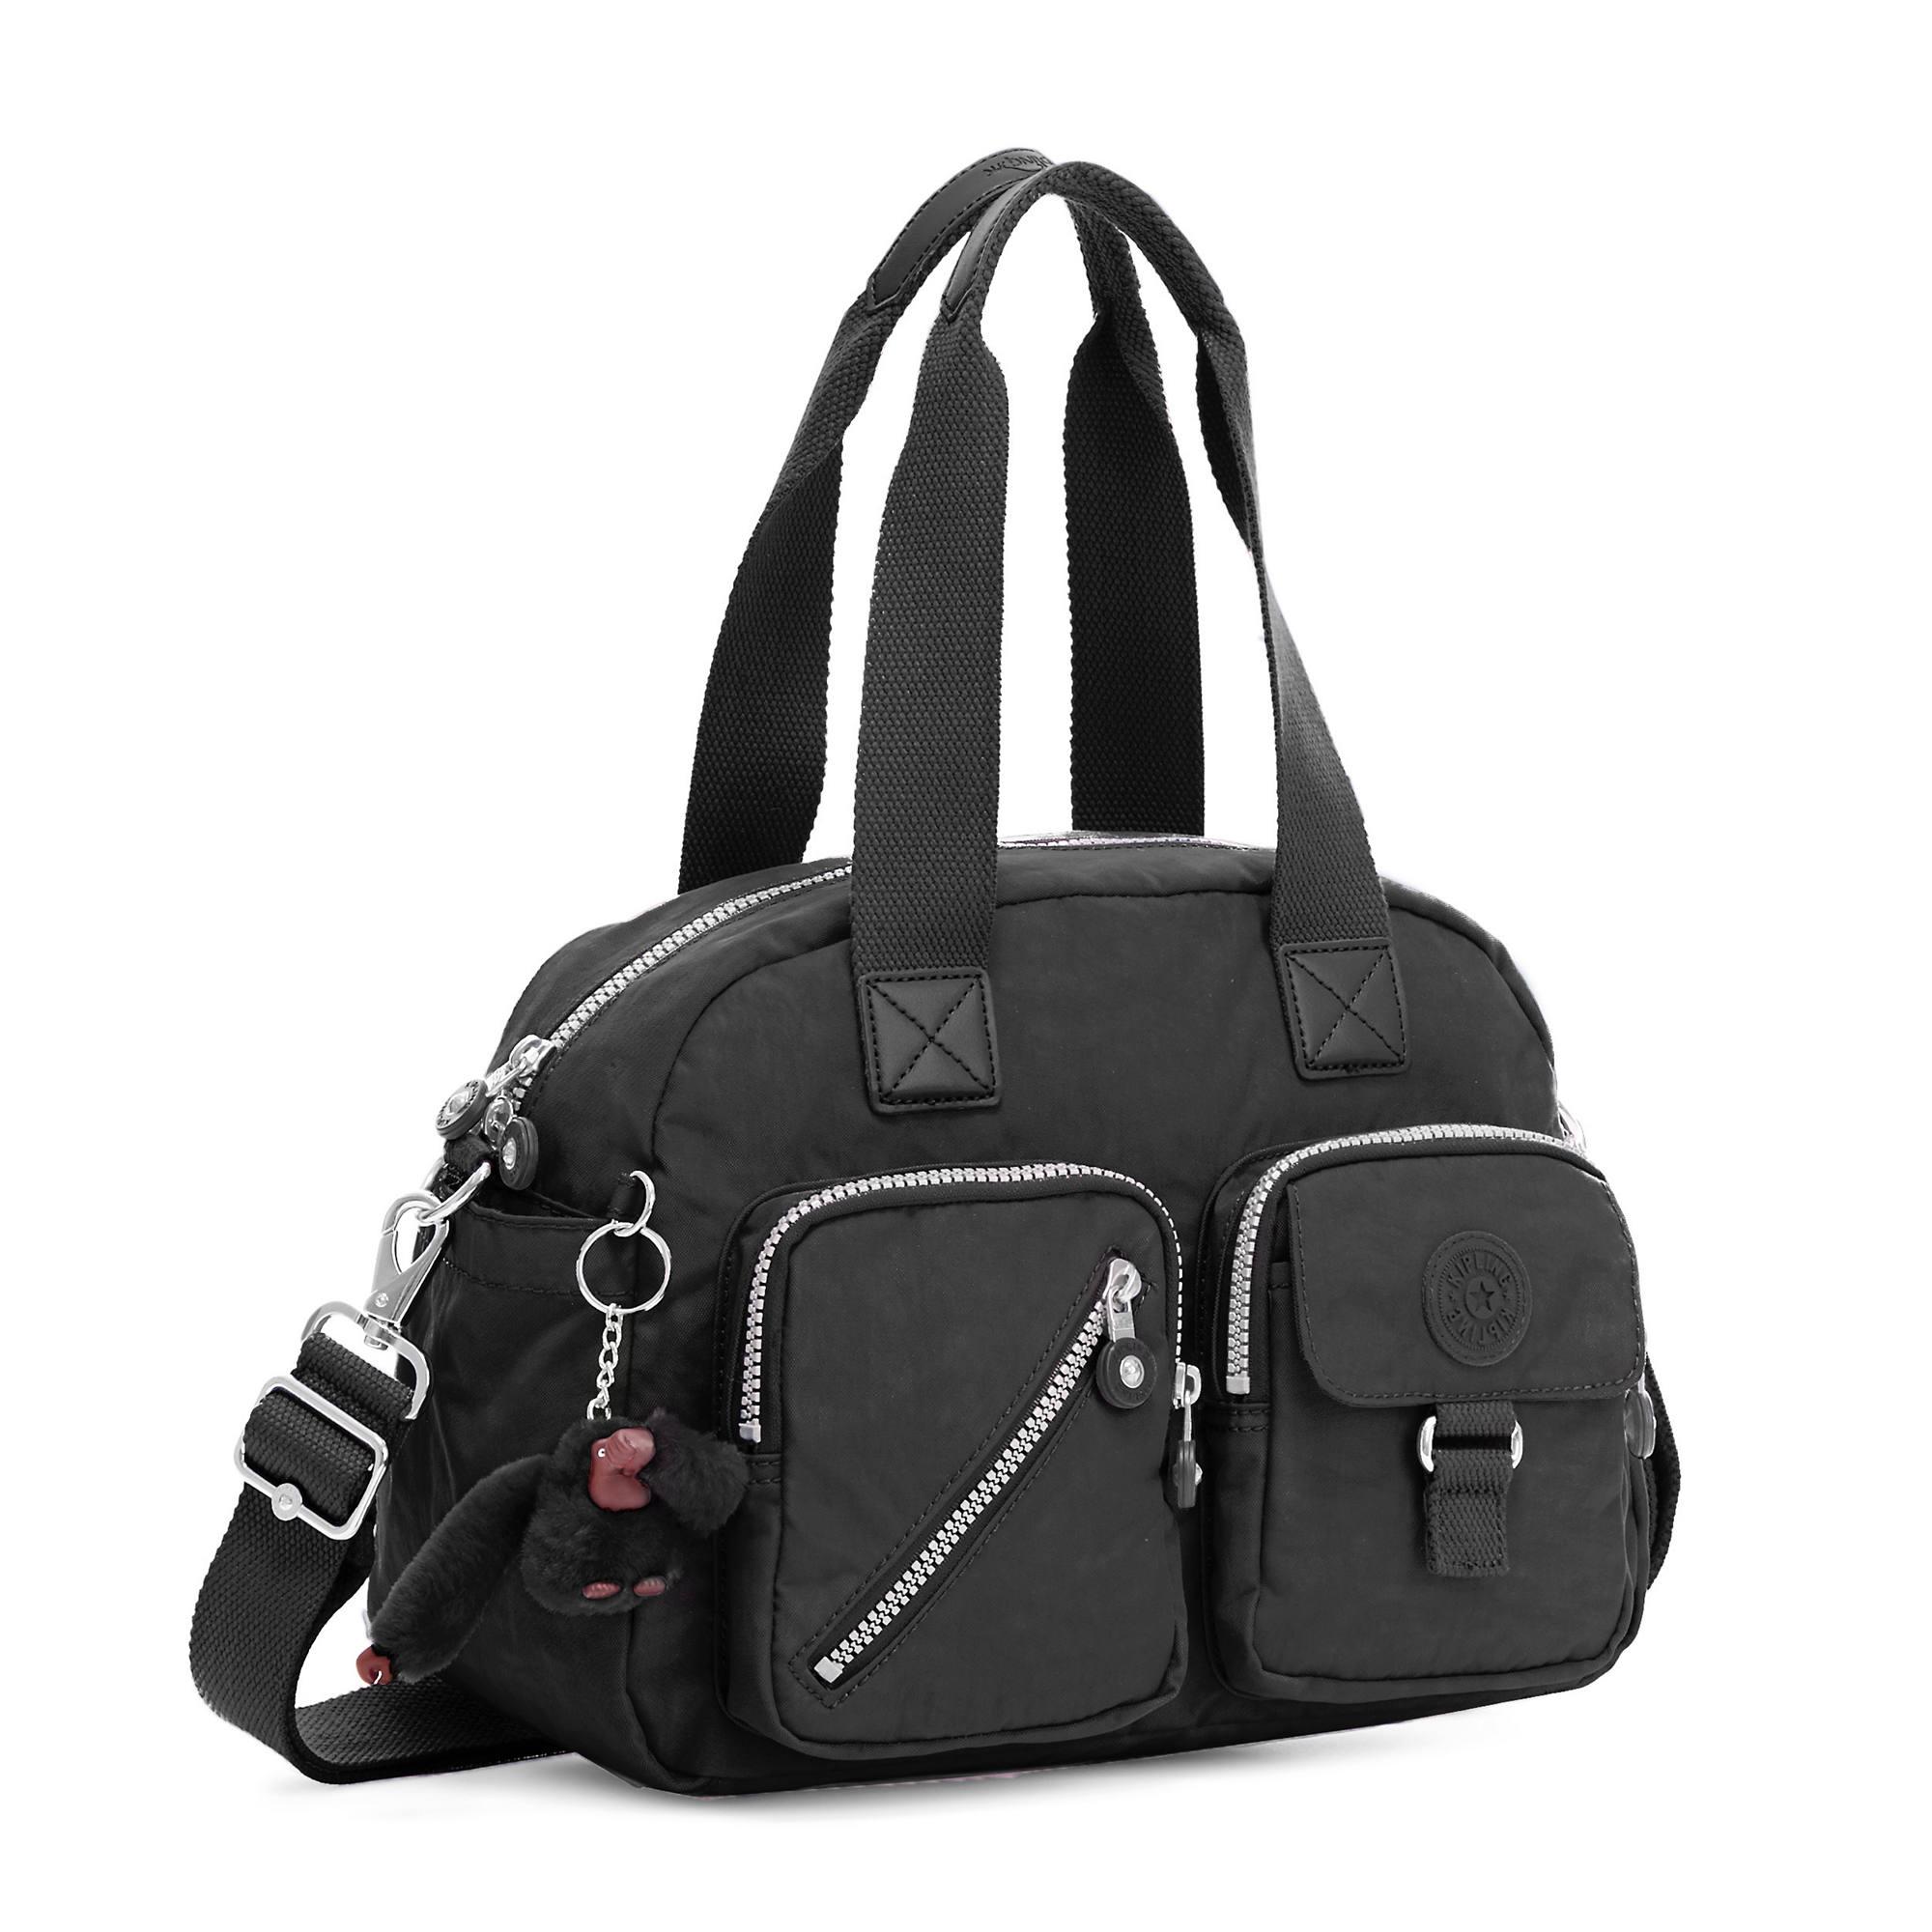 Defea Handbag Black Large